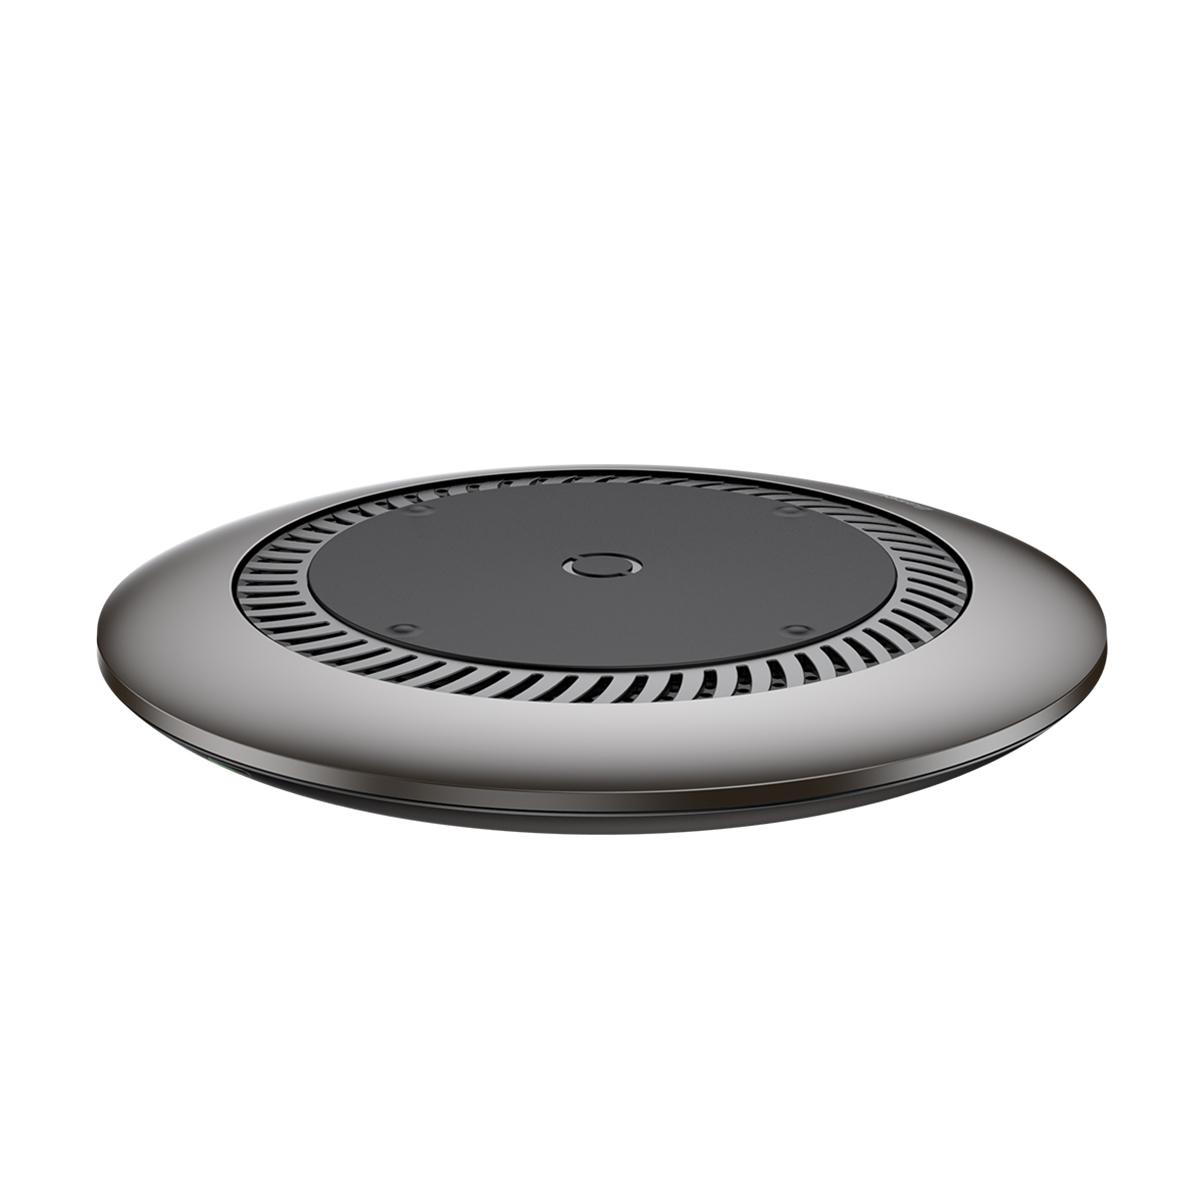 Беспроводное зарядное устройство Baseus whirlwind Desktop wireless charger Black беспроводное зарядное устройство devia aurora ultra slim wireless black